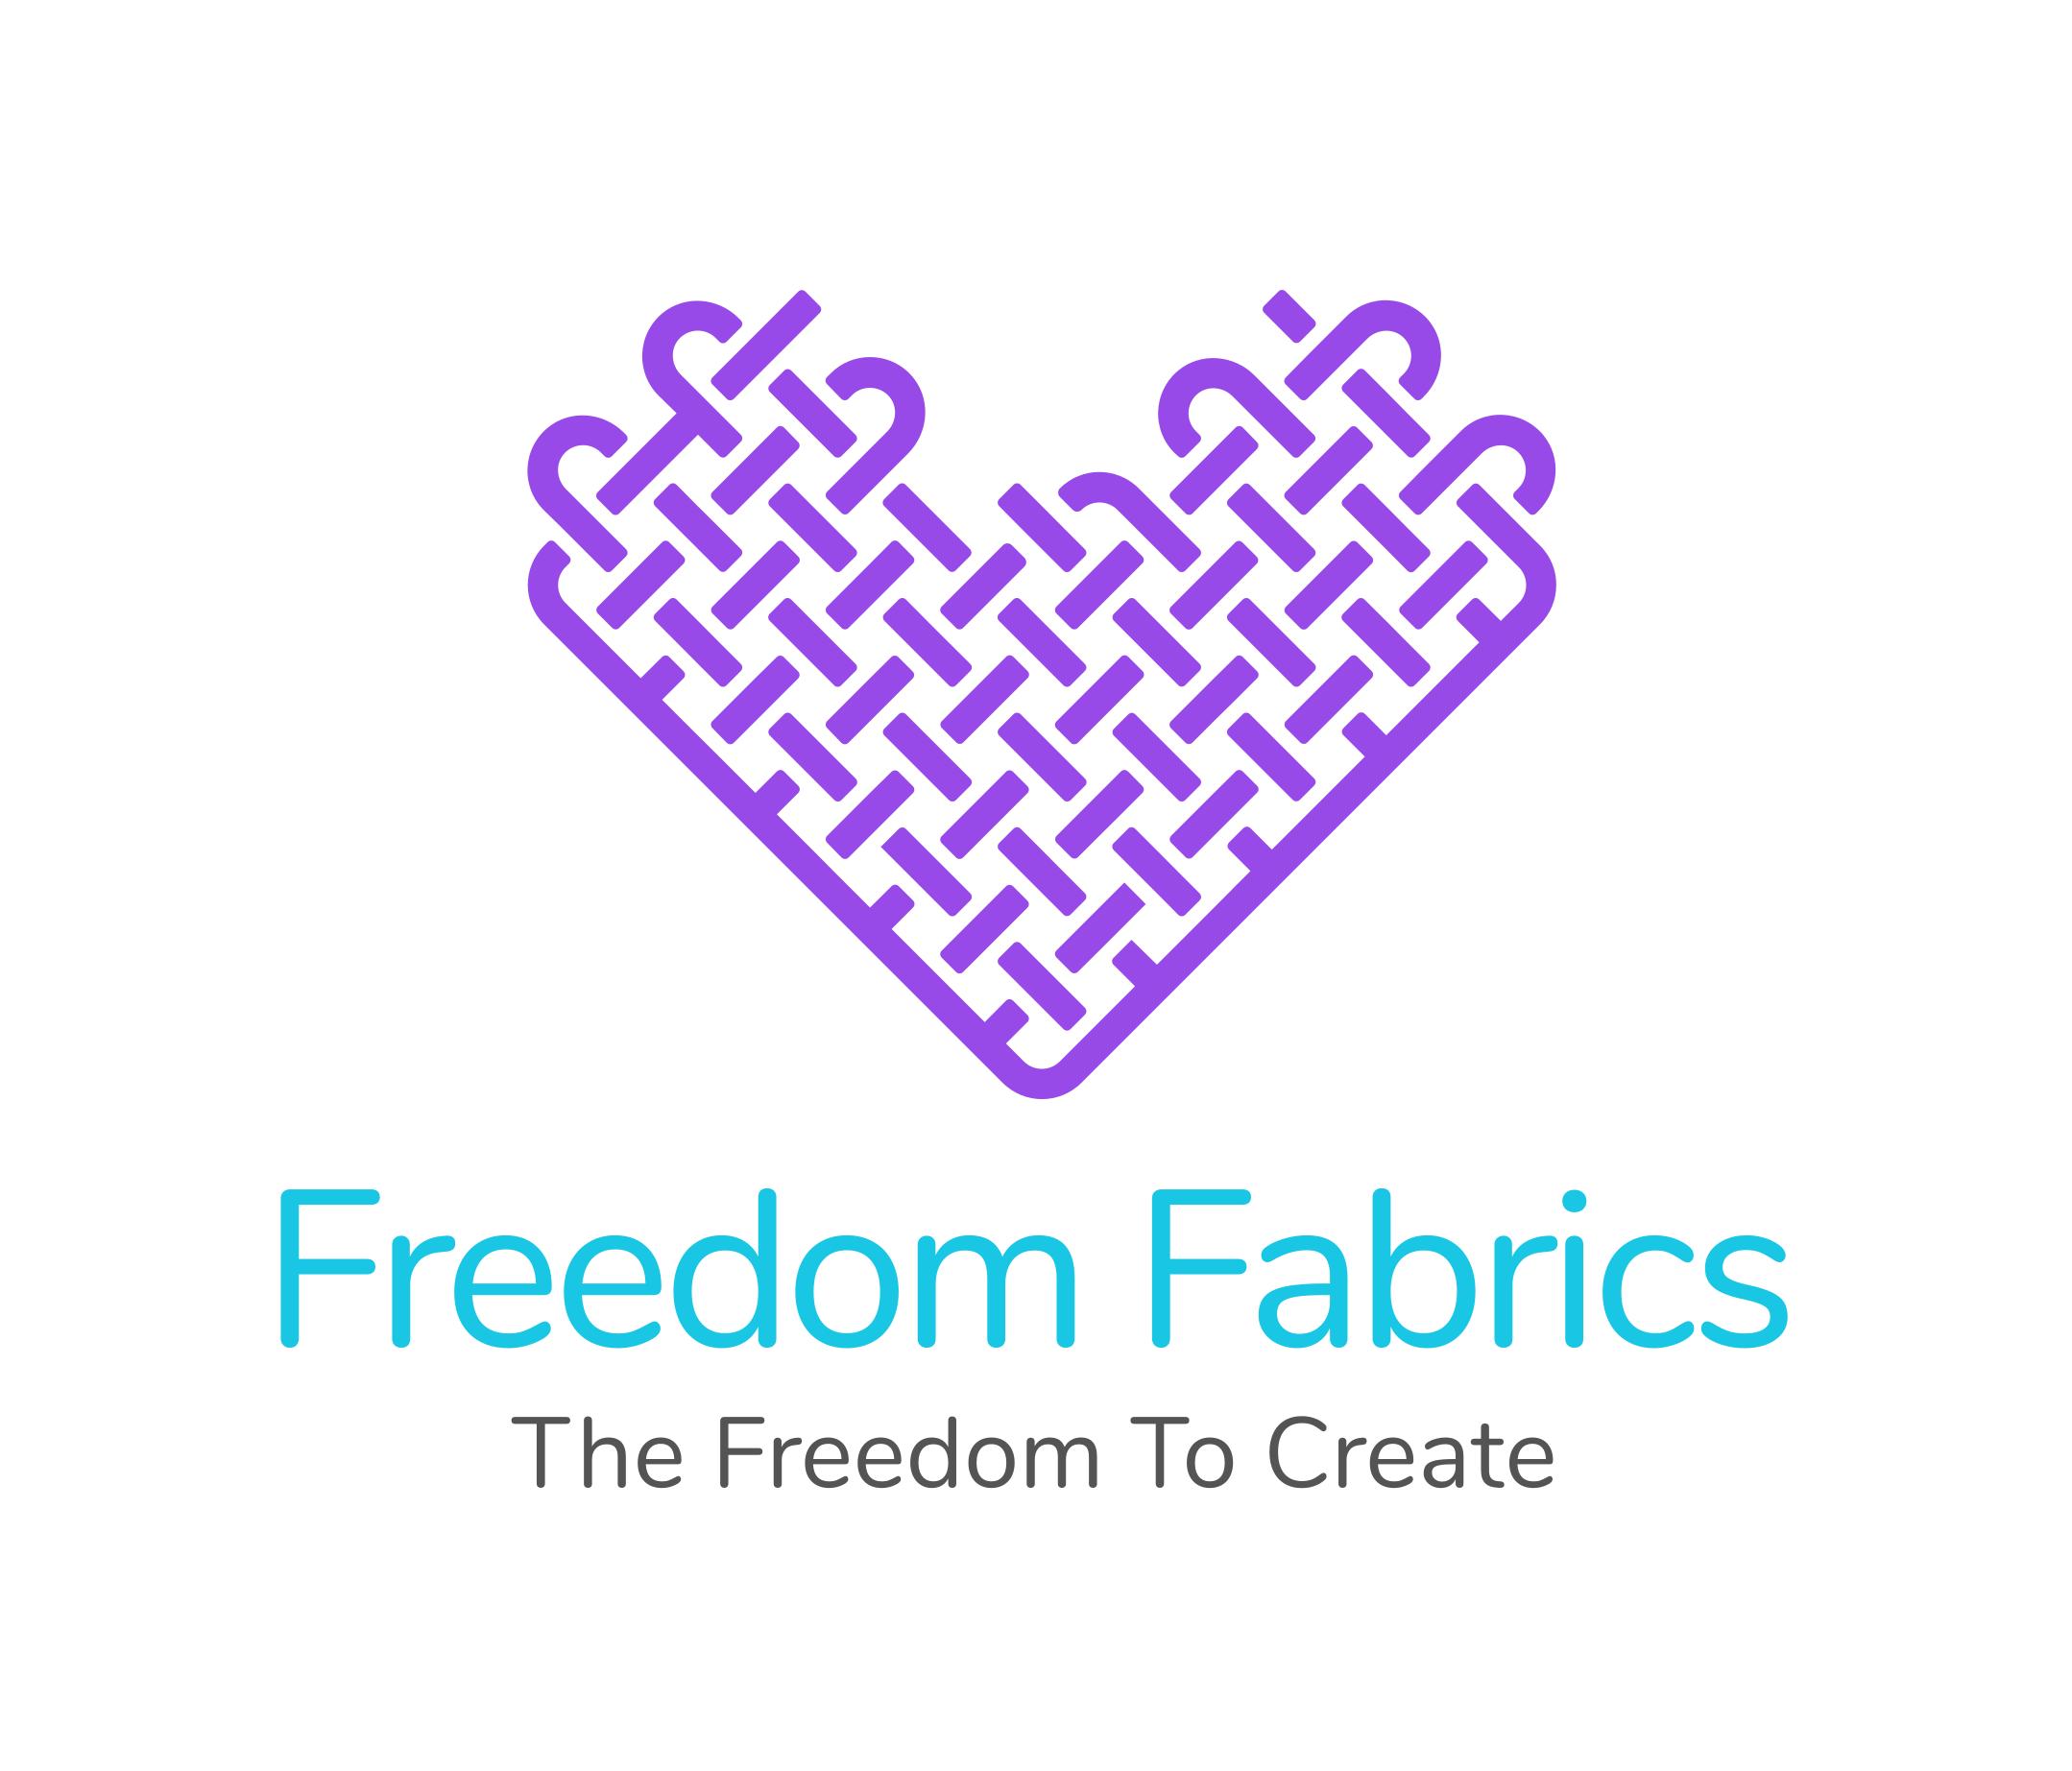 Freedom Fabrics